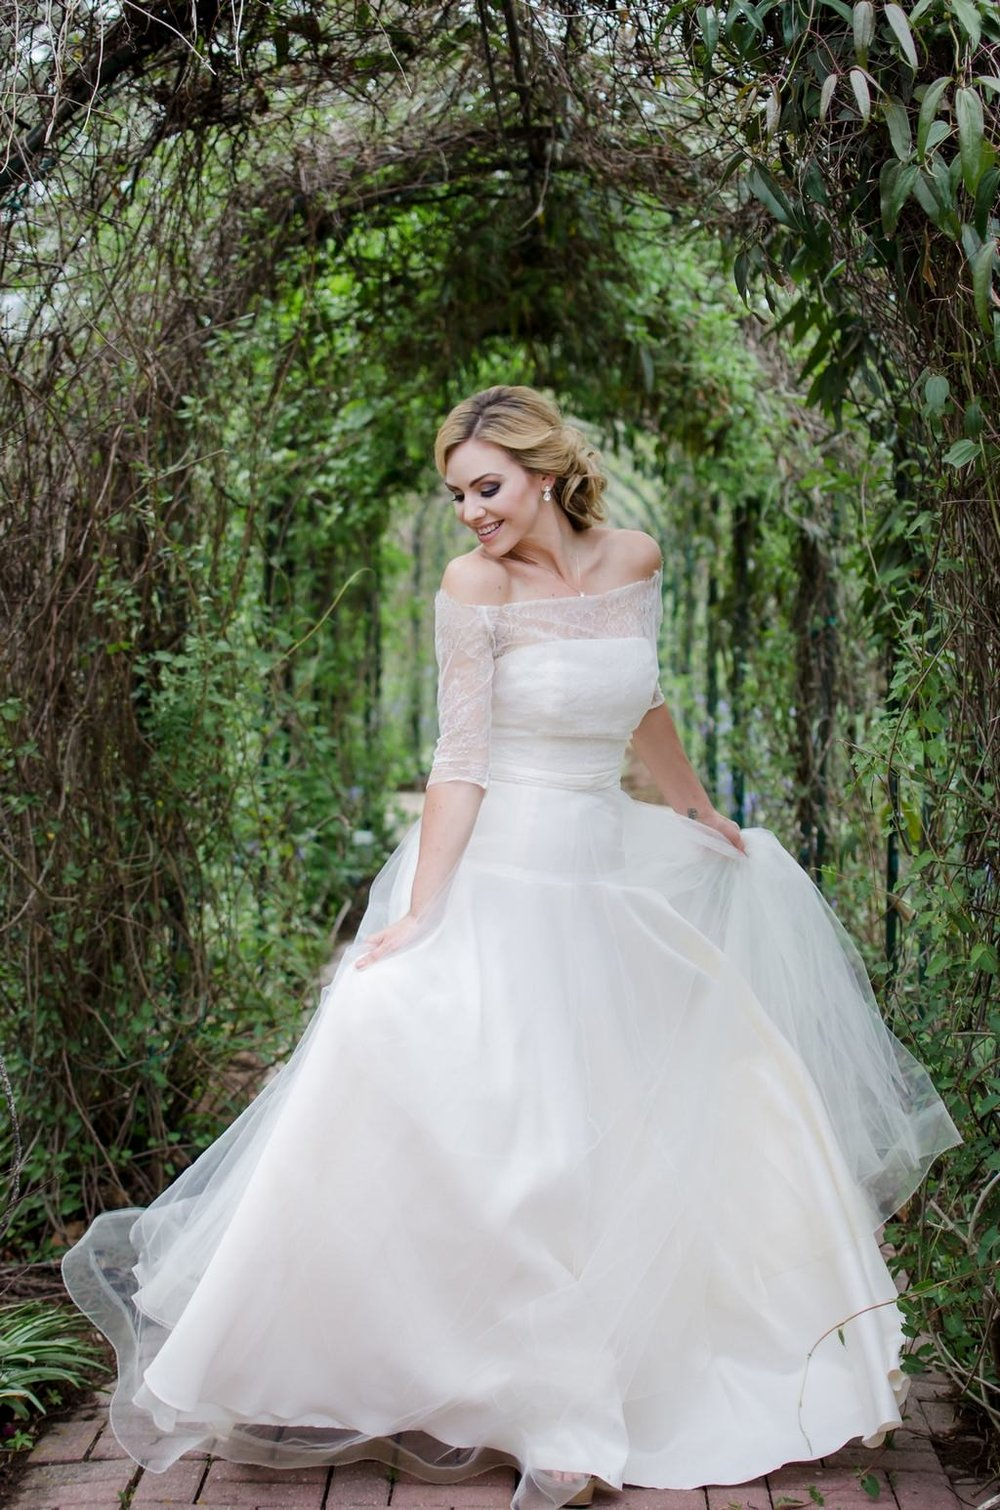 Intimate-spring-elopement-Riverwood-Mansion-Nashville-Wedding-Photographer+11